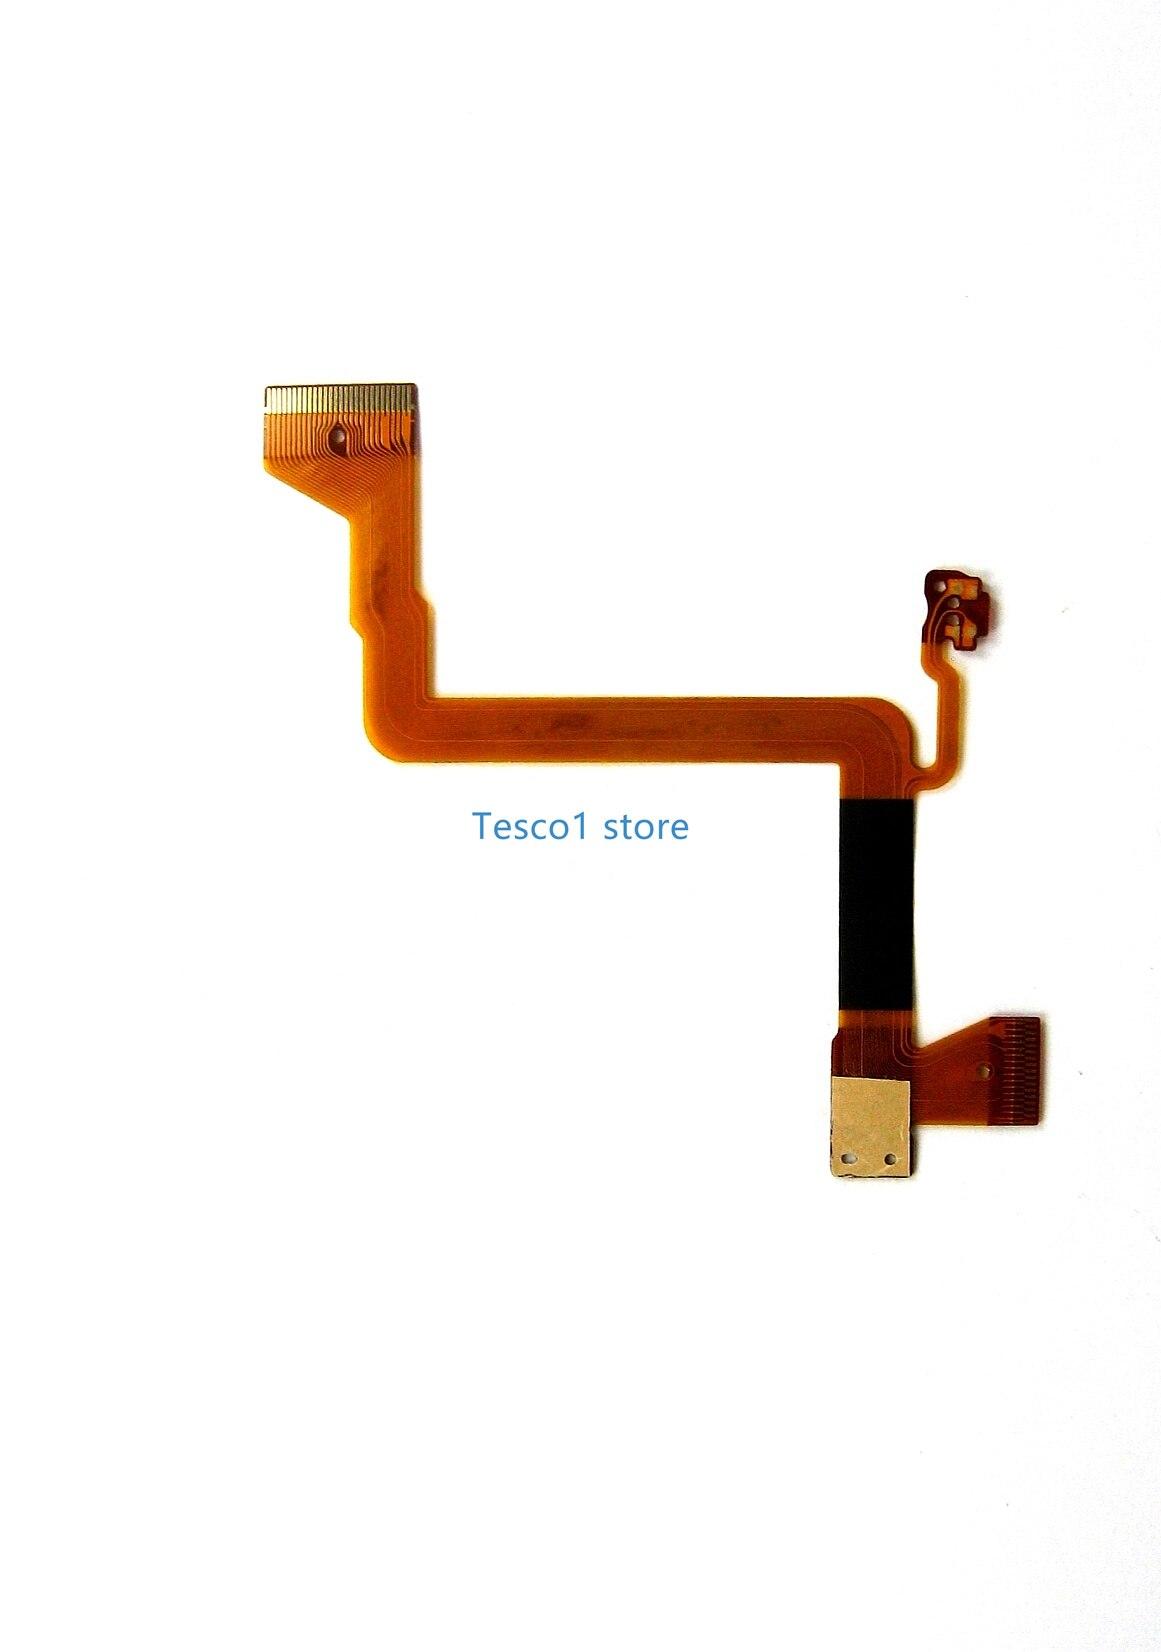 LCD Flex Cable plano para Panasonic SDR-S26 H80 H90 parte de reemplazo